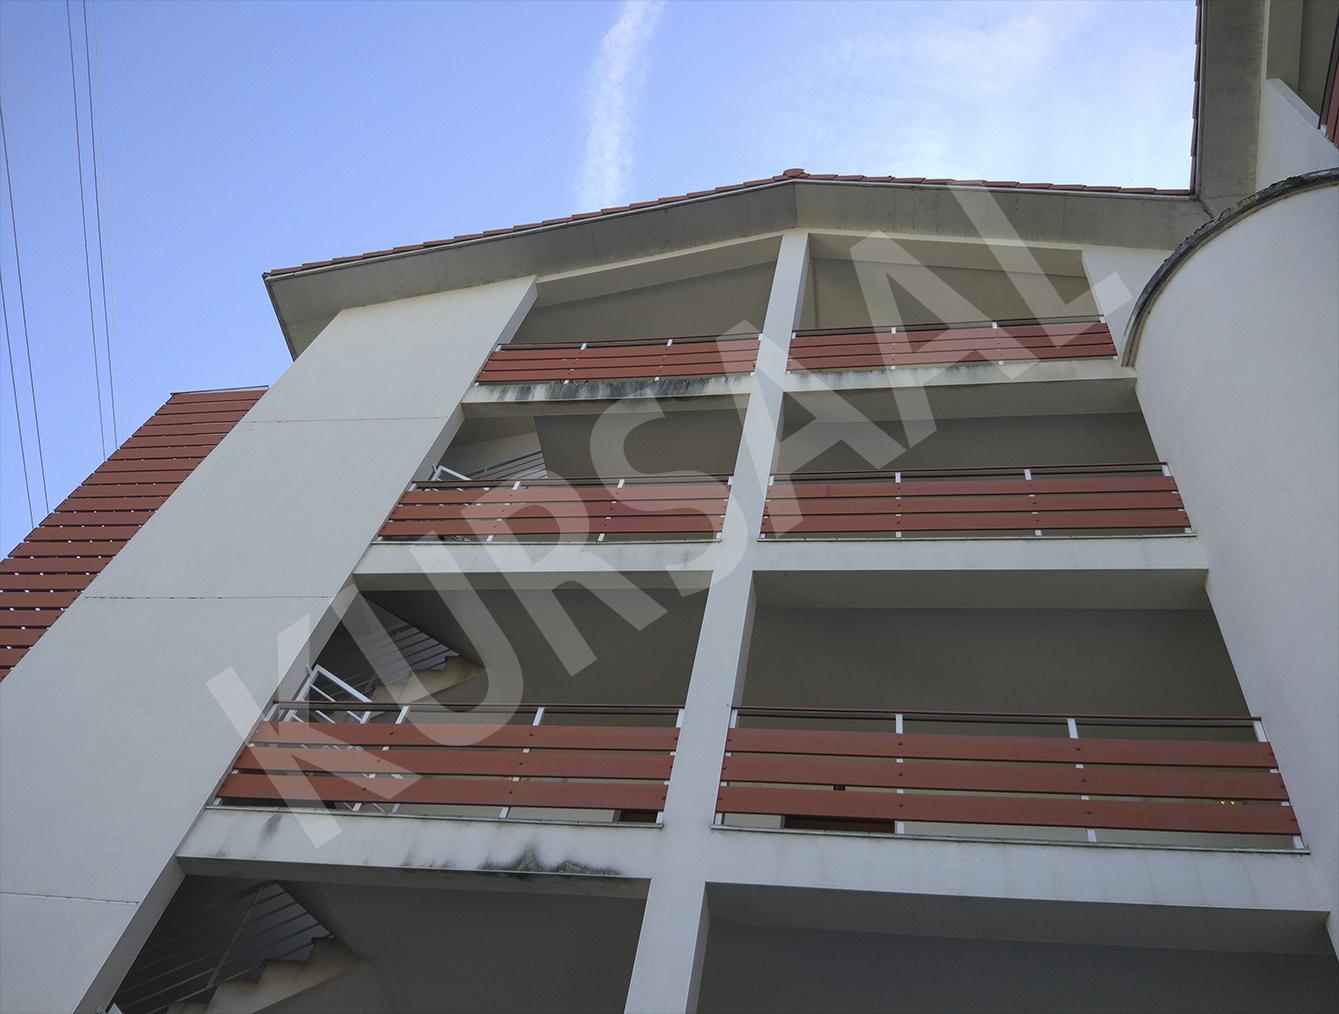 foto 7 - Aislamientos Térmicos y Eficiencia Energética-Amalkor 1-ADUNA- GIPUZKOA